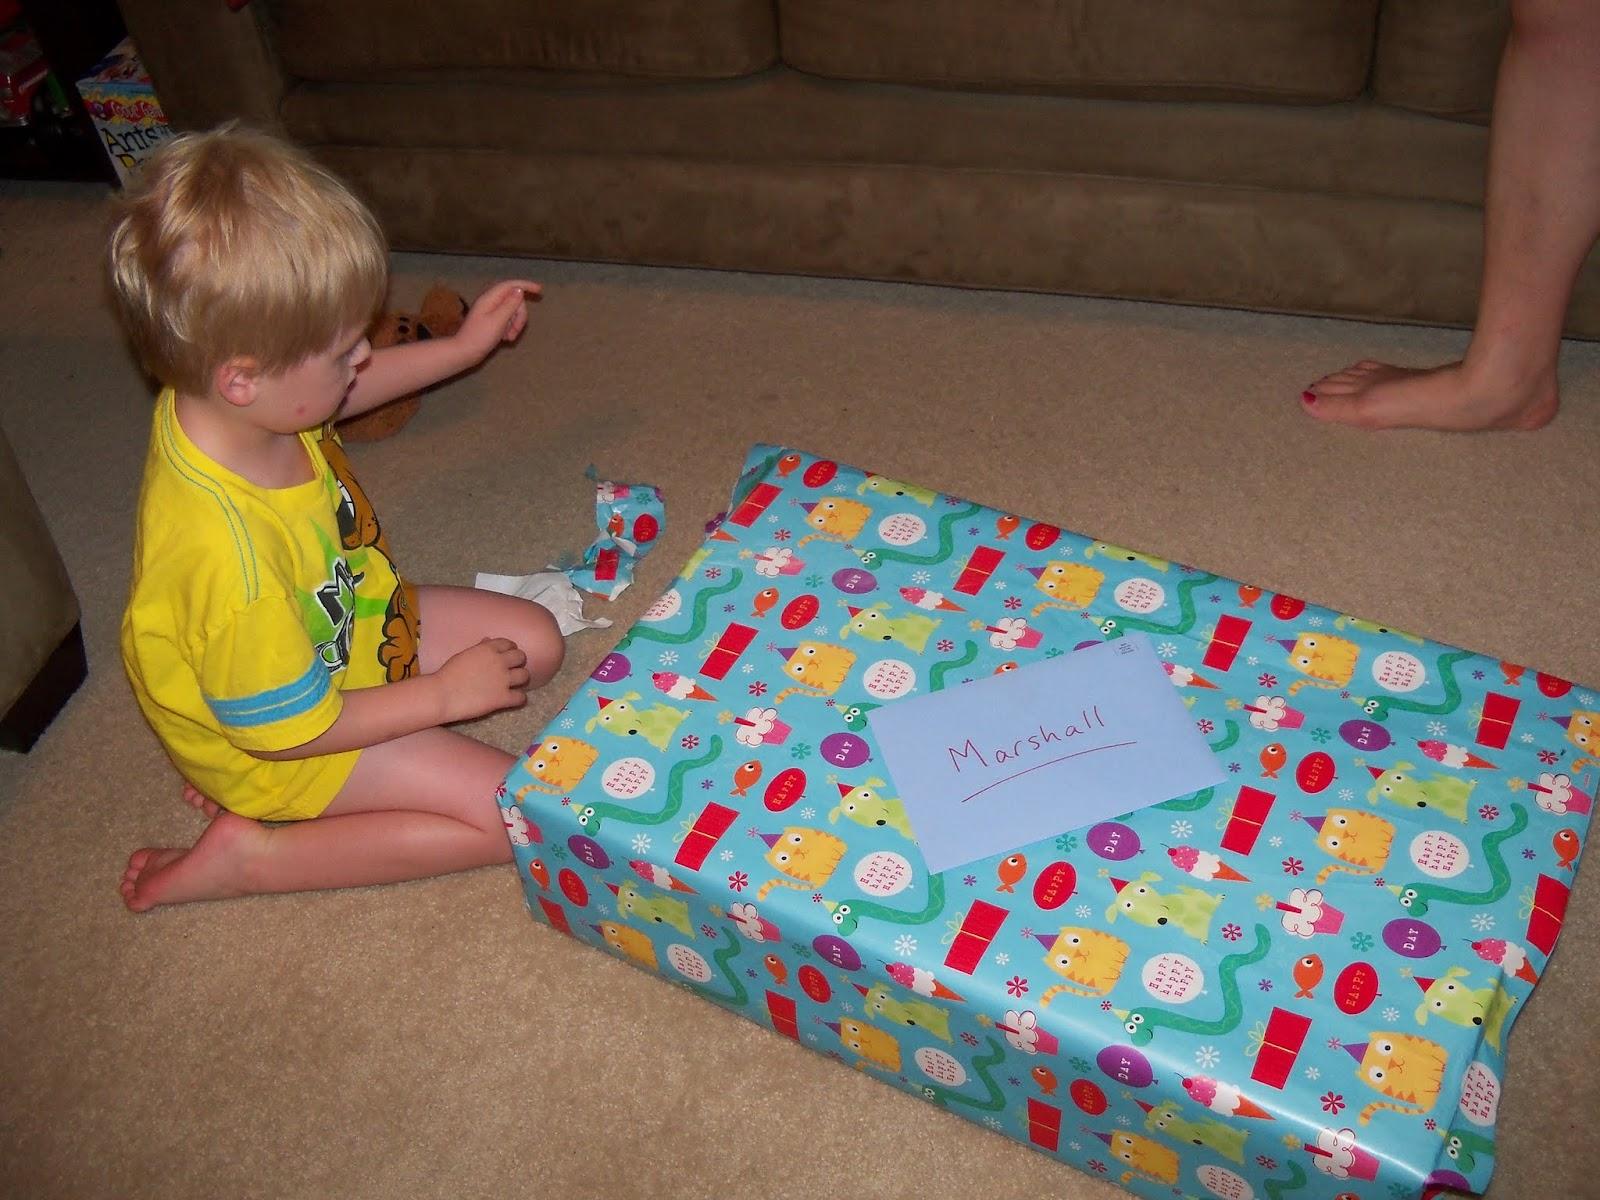 Marshalls Third Birthday - 116_8854.JPG